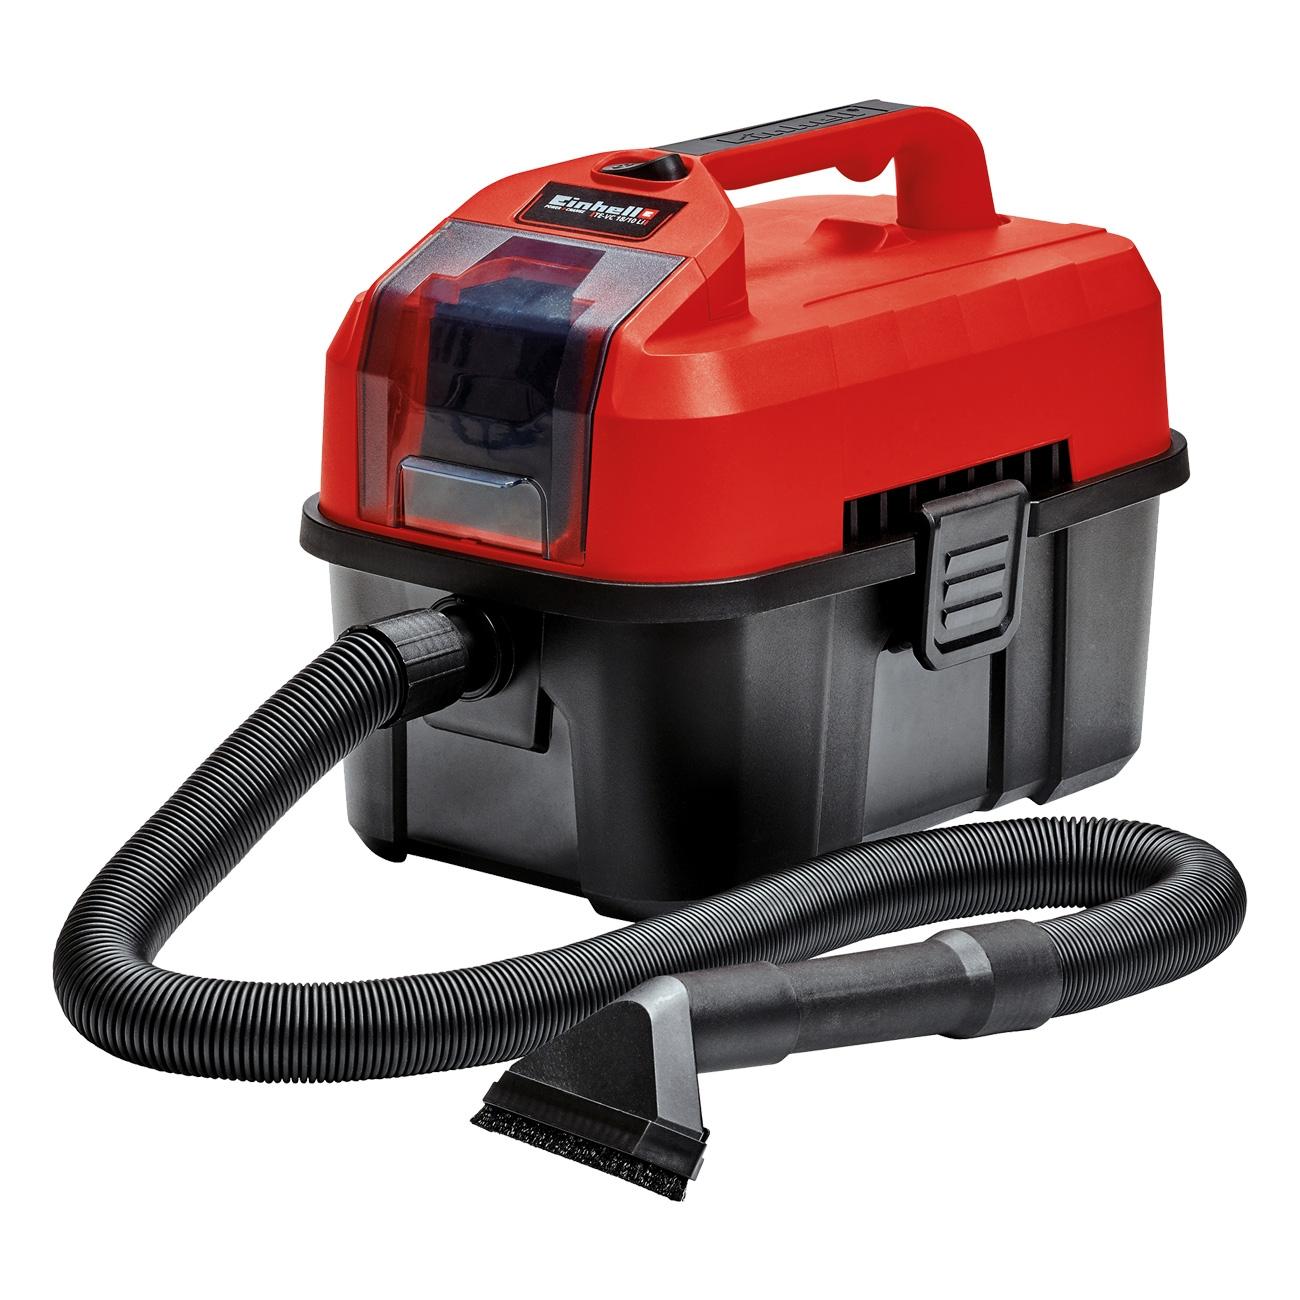 Einhell TE-VC 18/10 Li Cordlee Vacuum cleaner